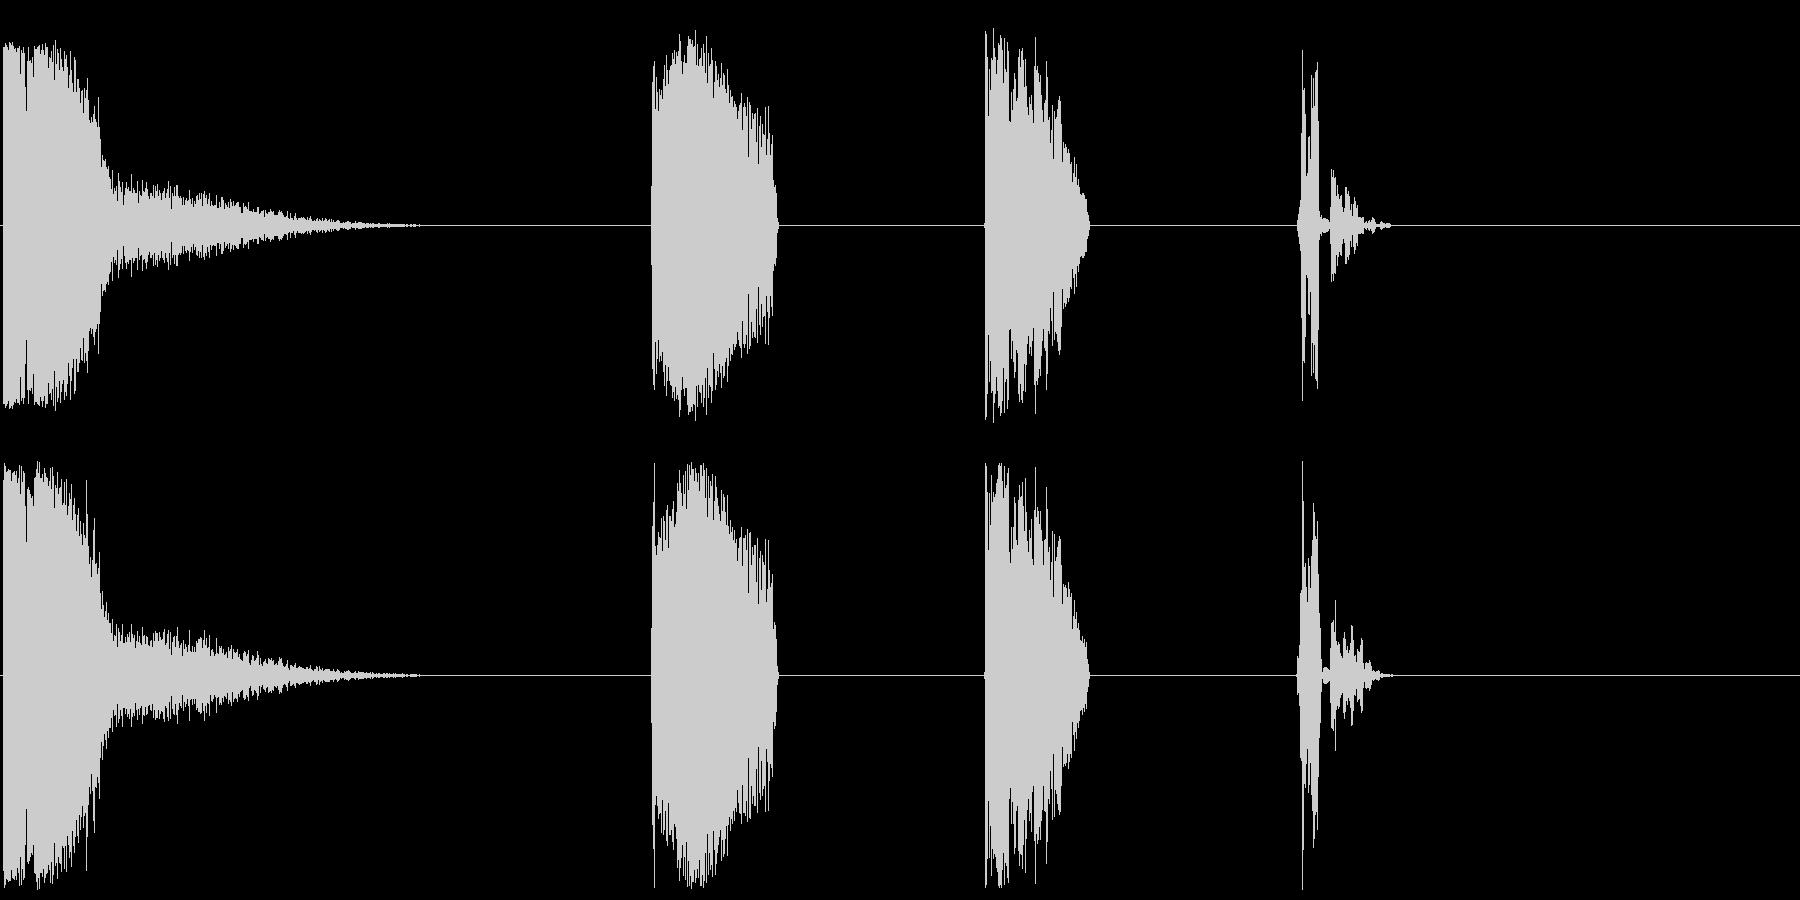 DJレーザーファイアーX4の未再生の波形